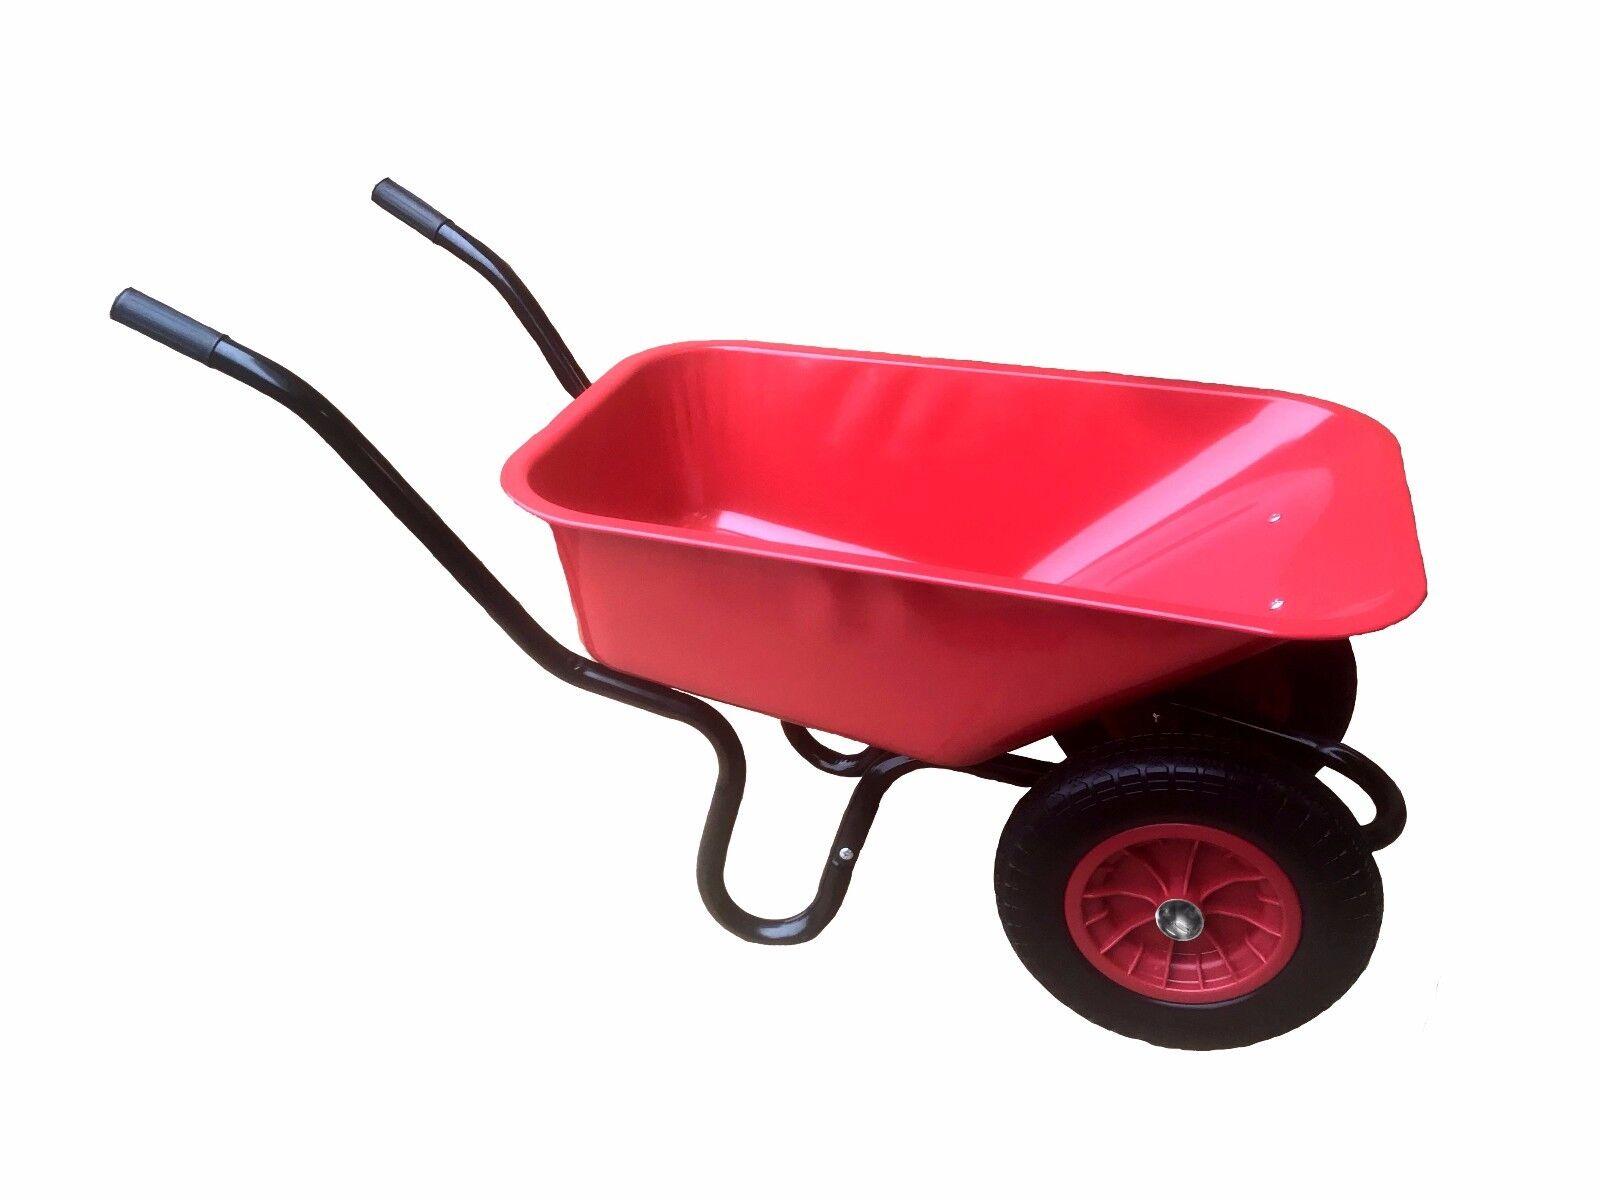 110L DOUBLE wheelbarrow - with pneumatic wheel and red metal body wheel barrow